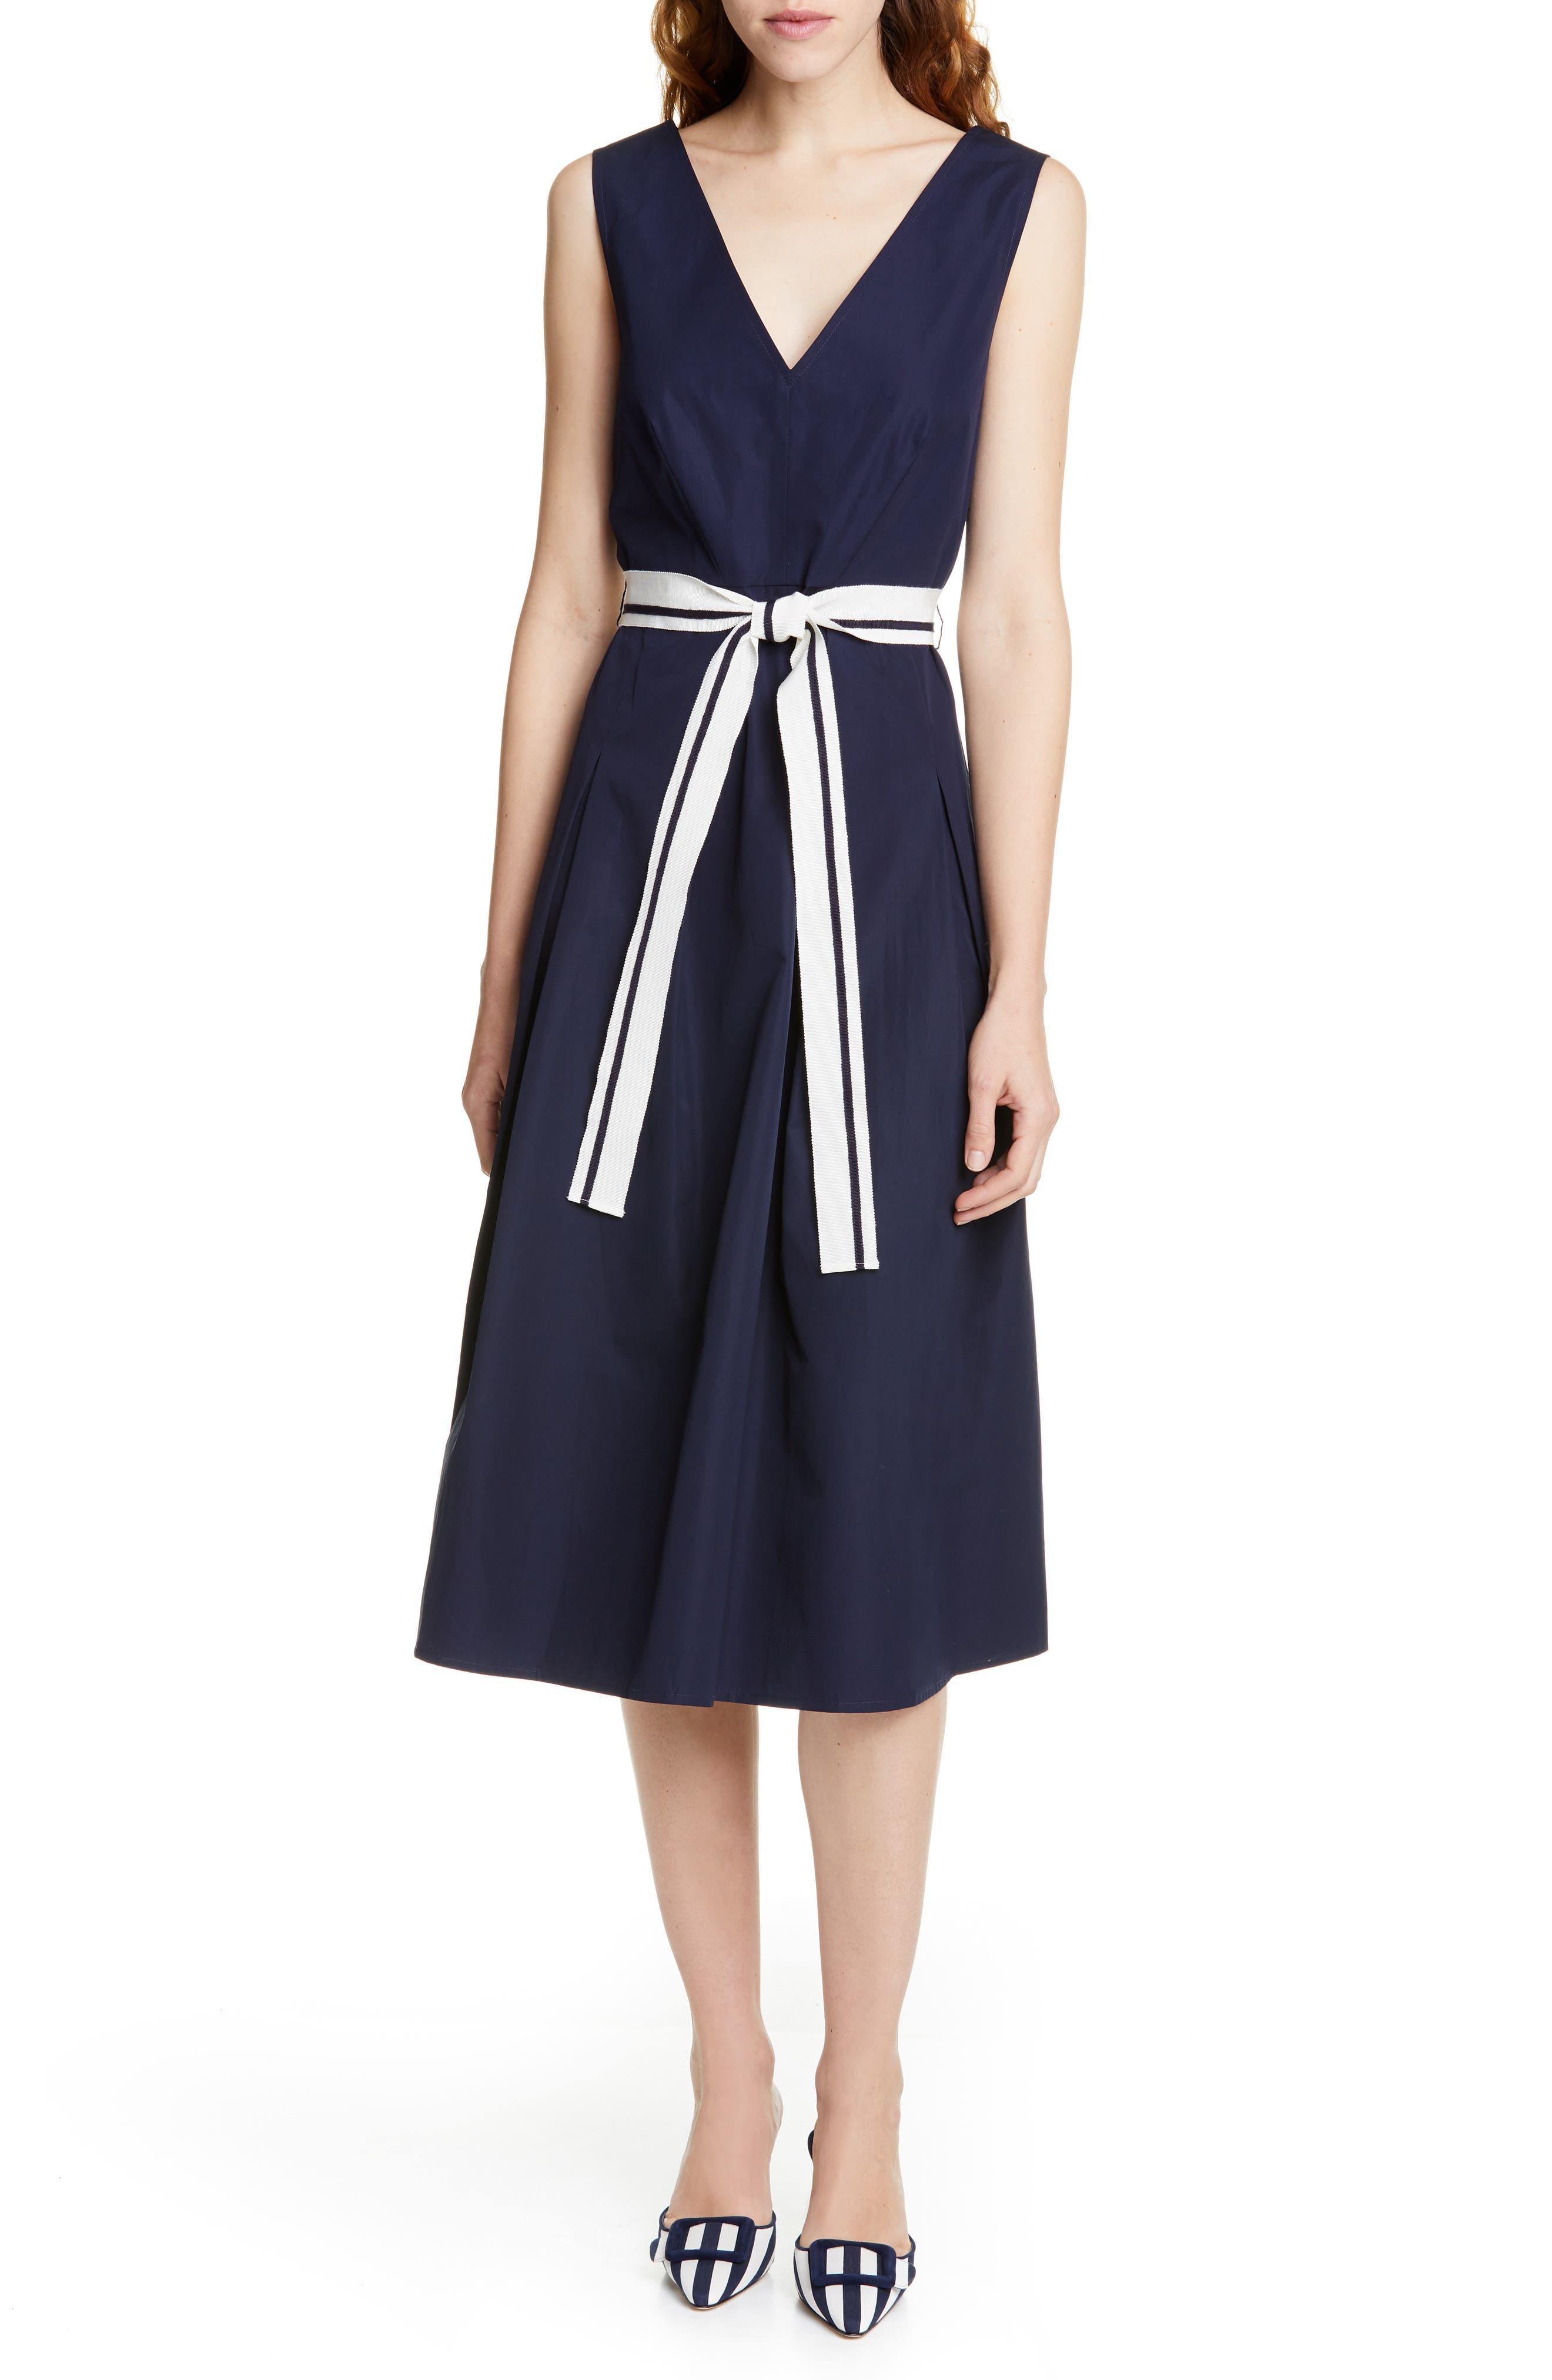 Judith & Charles Positano V-Neck Cotton Midi Dress, Blue